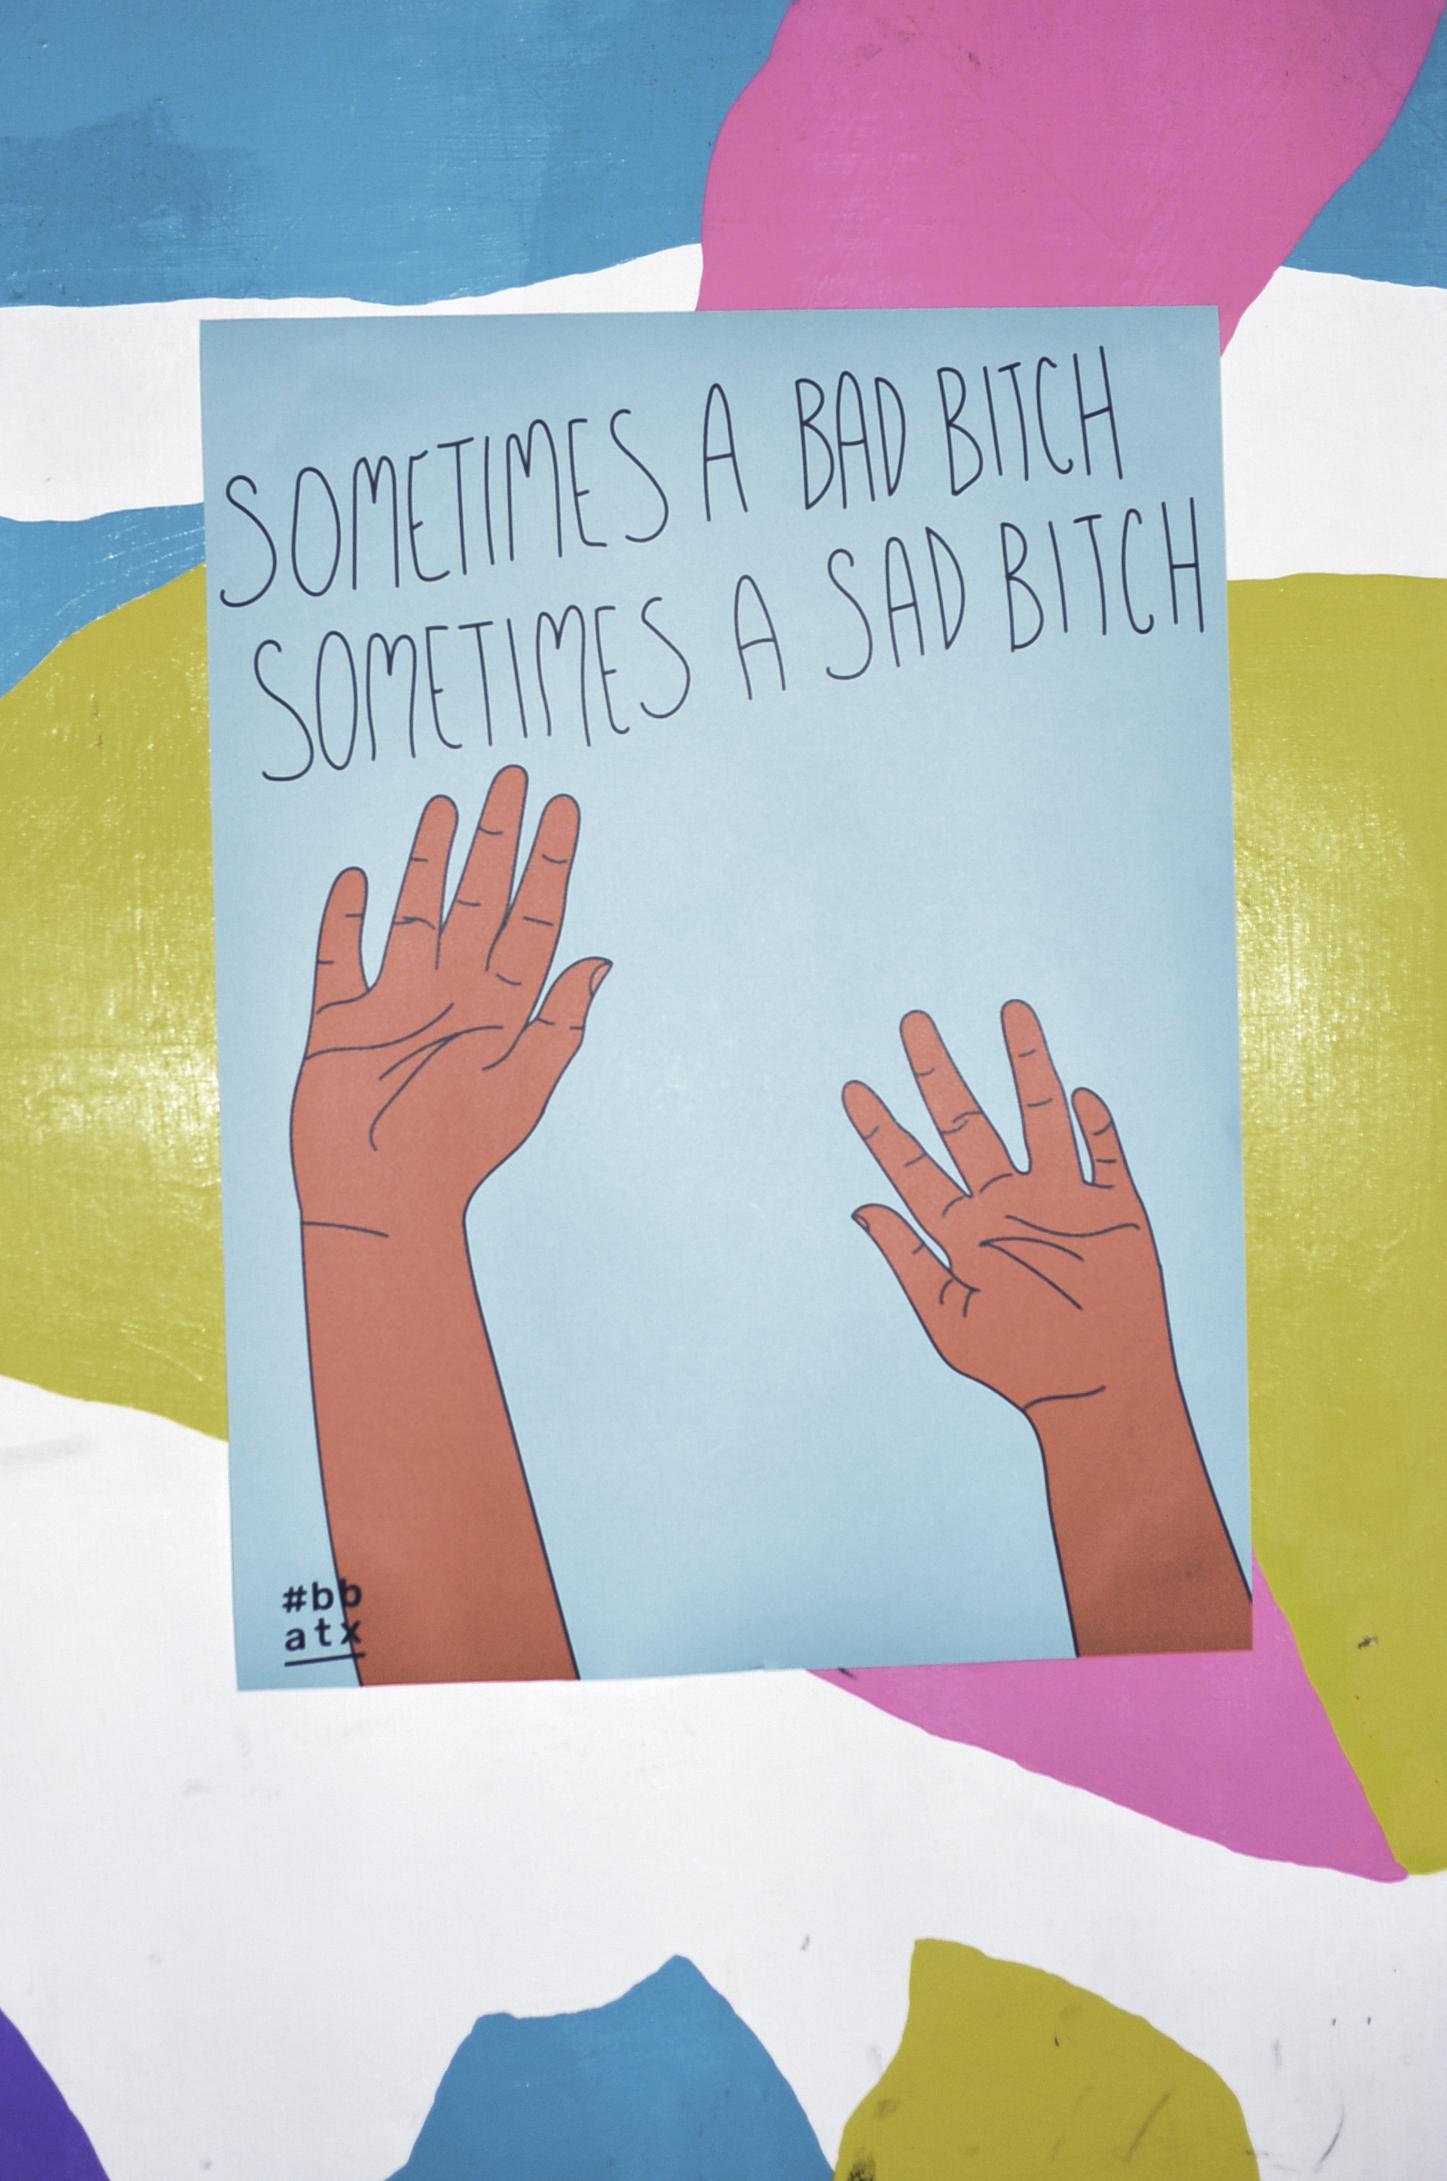 SOTU 2019 flyer series by Jasmine Brooks